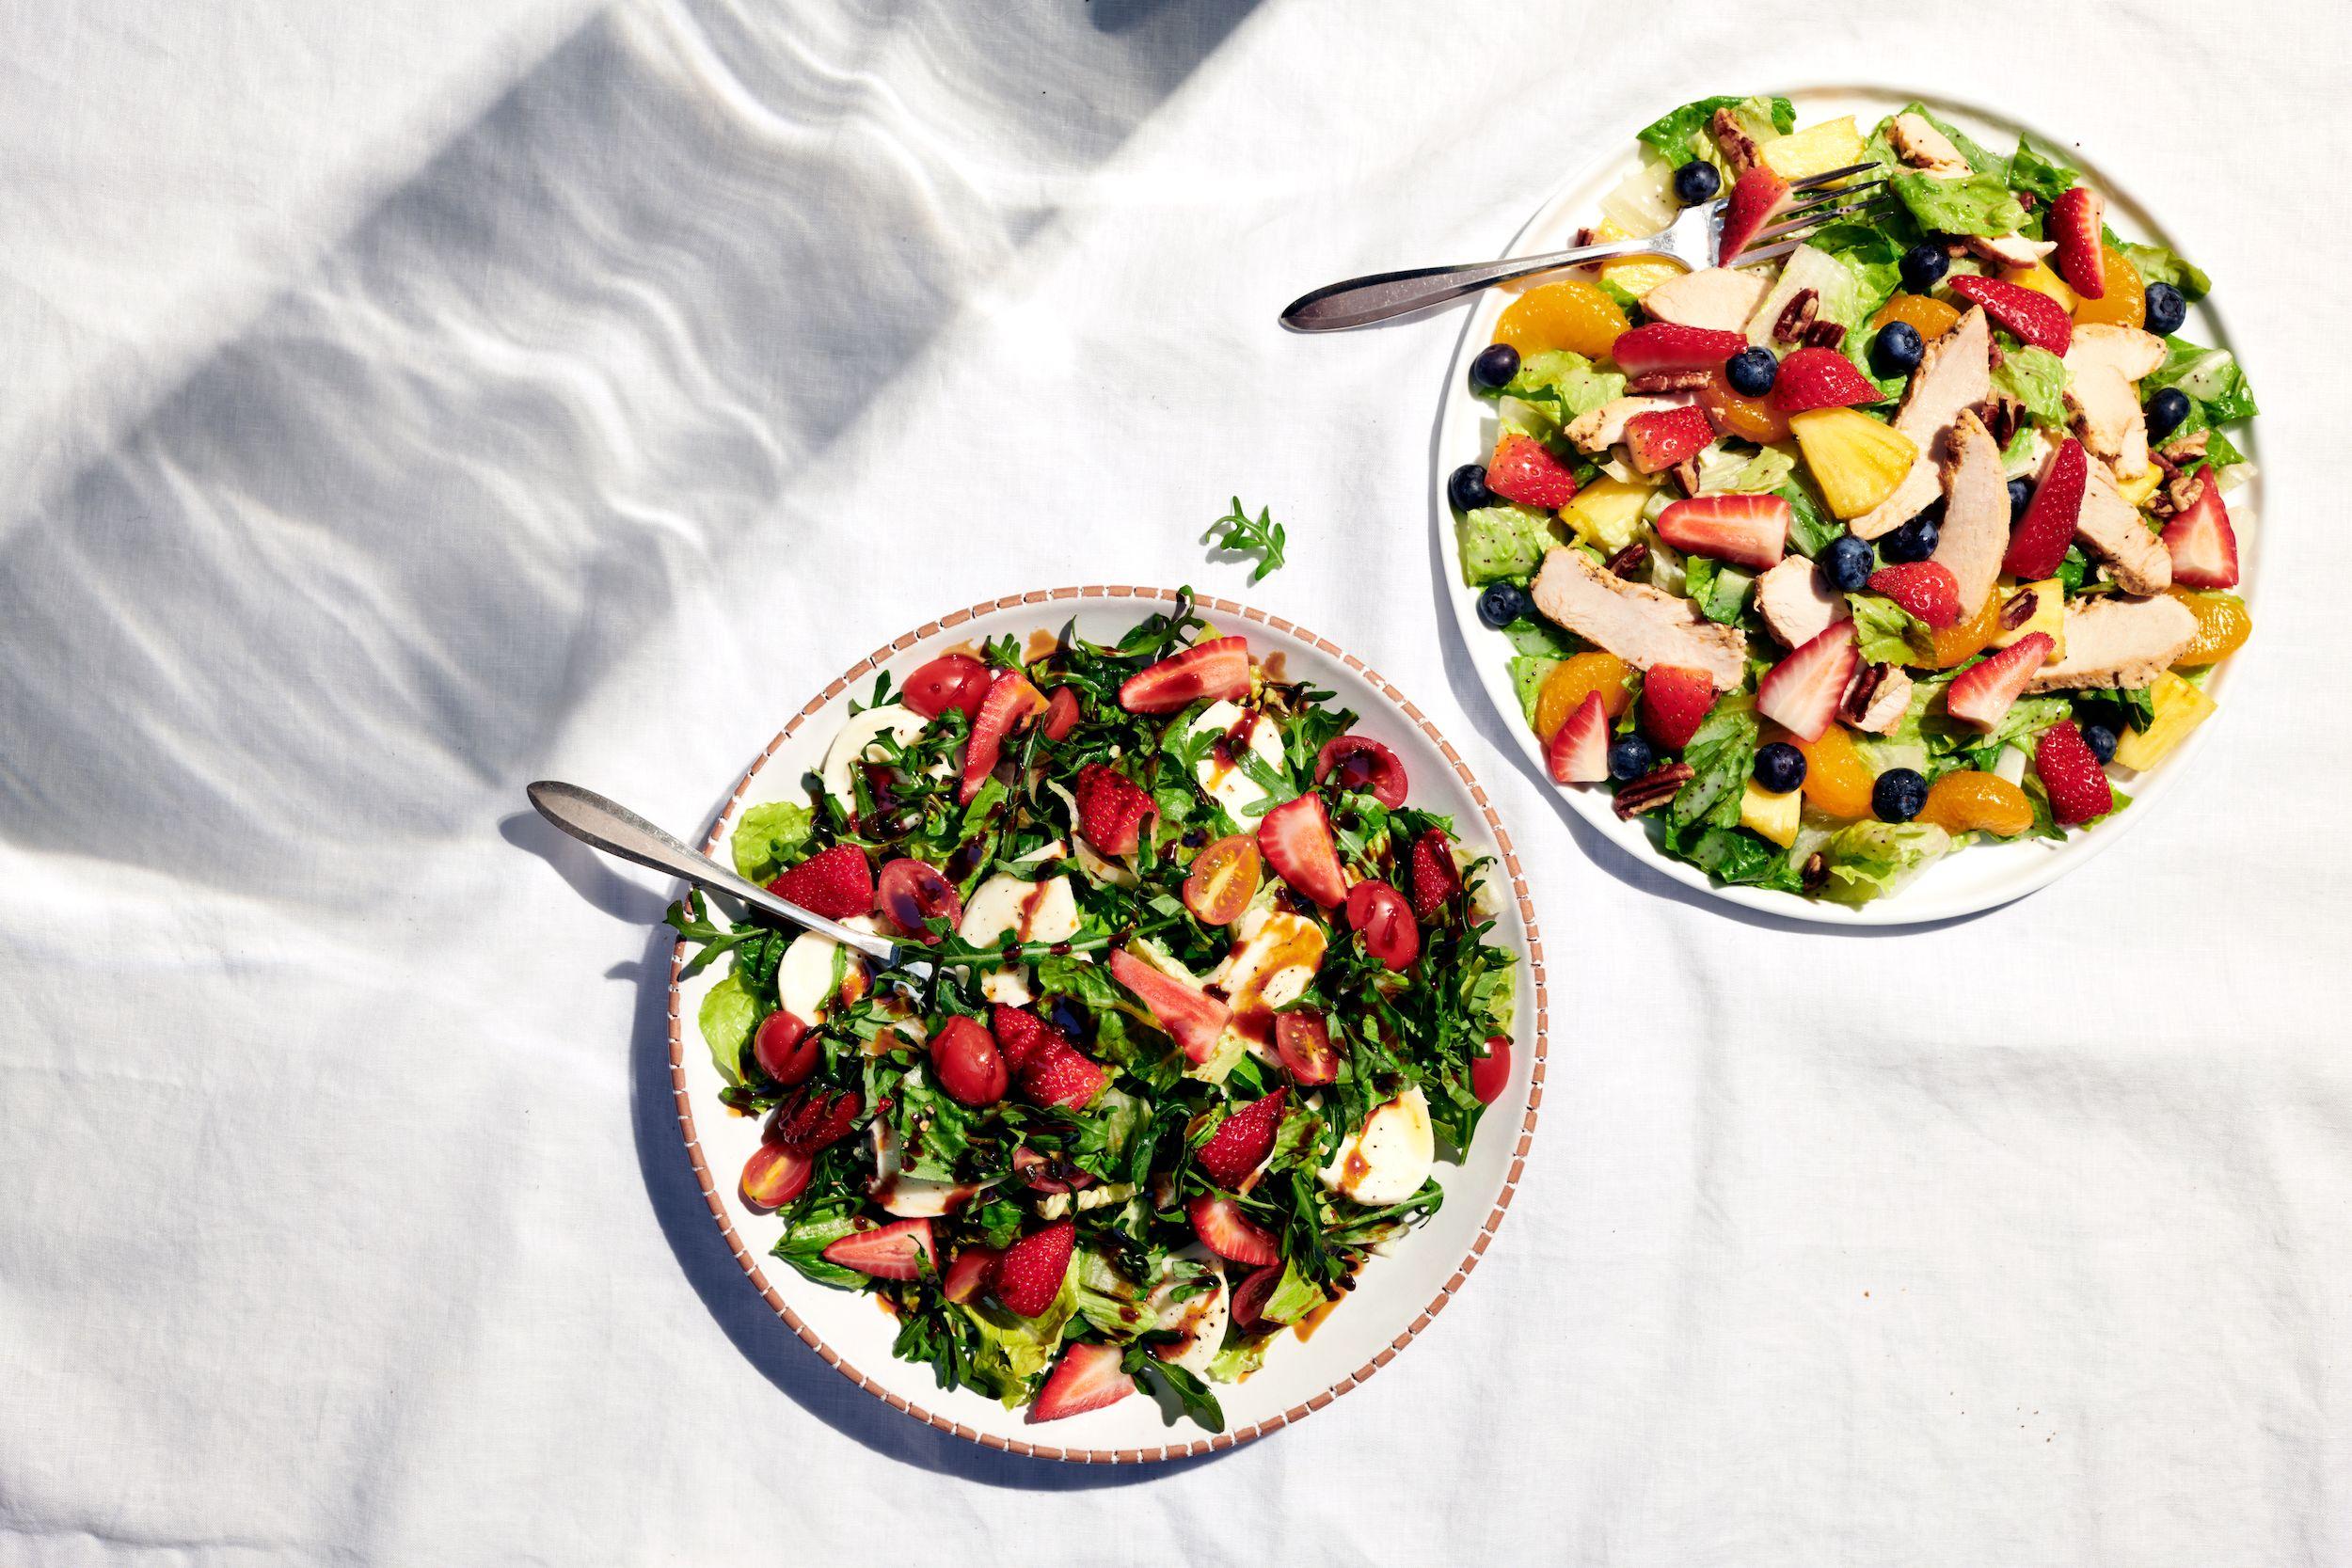 panera plant based diet